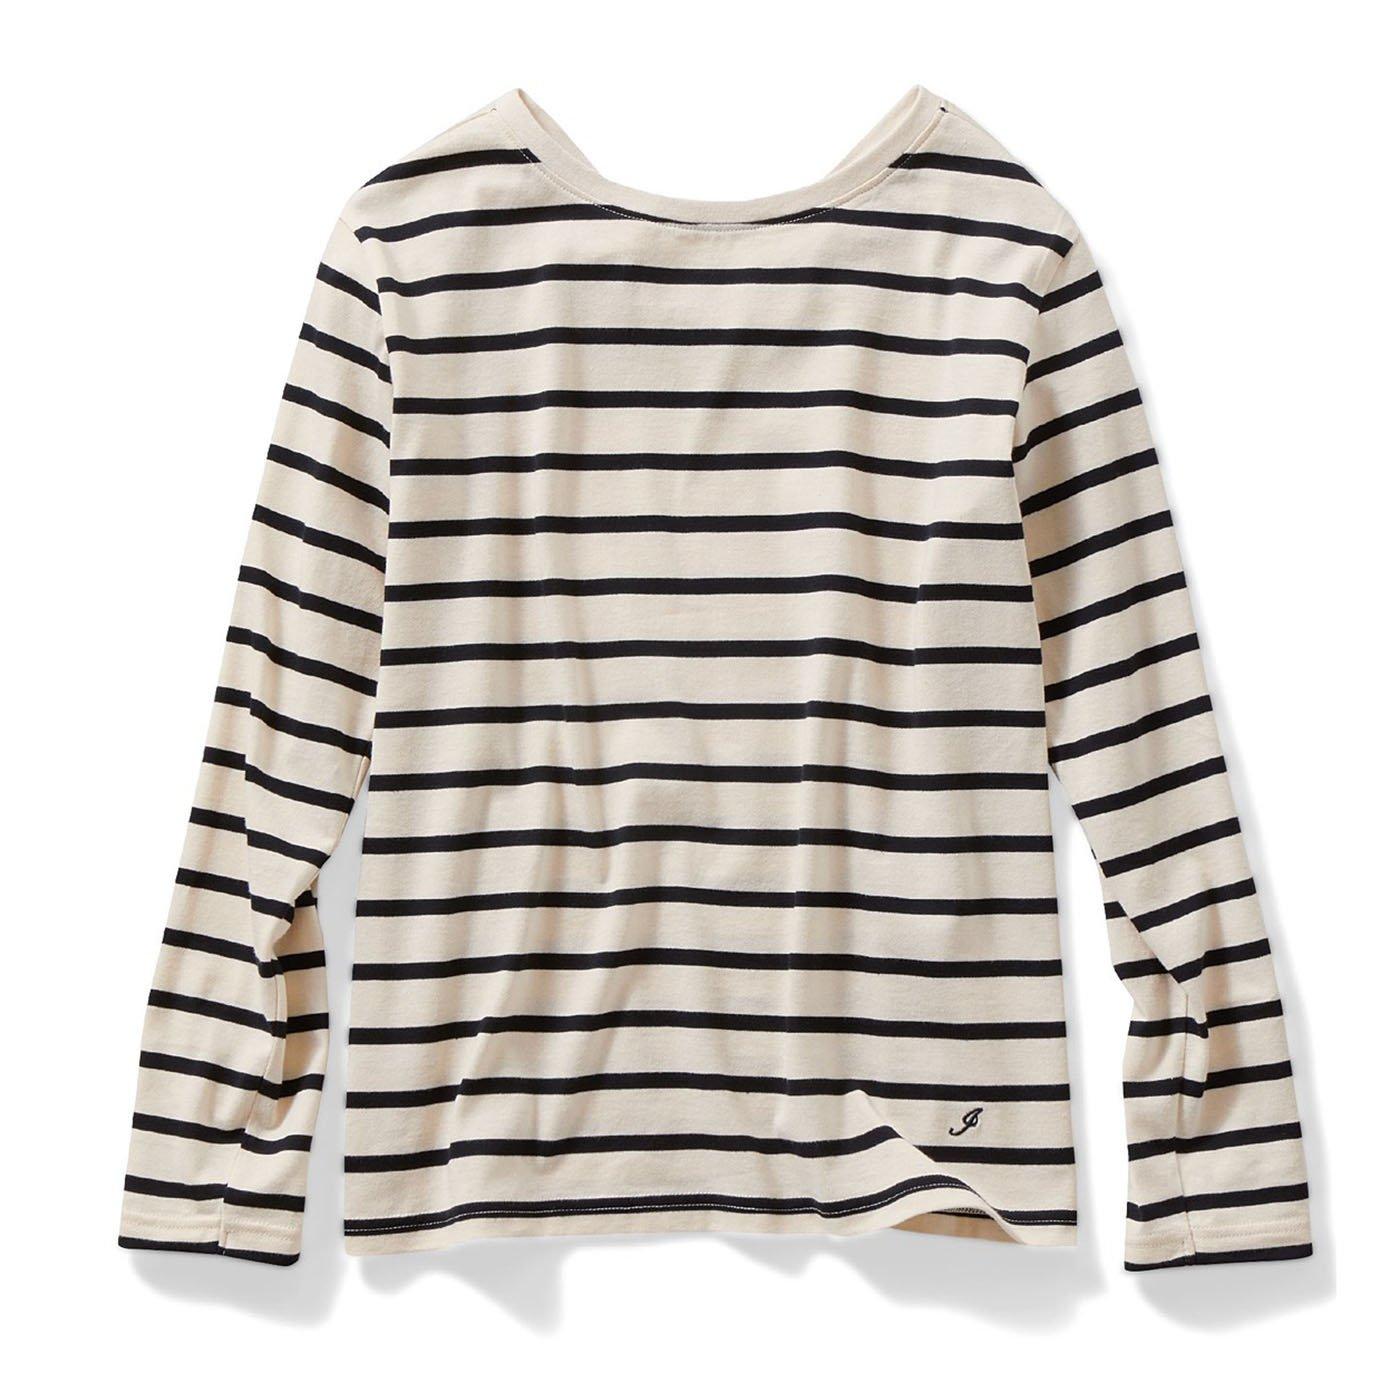 IEDIT[イディット]  カリフォルニアコットンのバックVネックボーダーTシャツ〈アイボリー〉